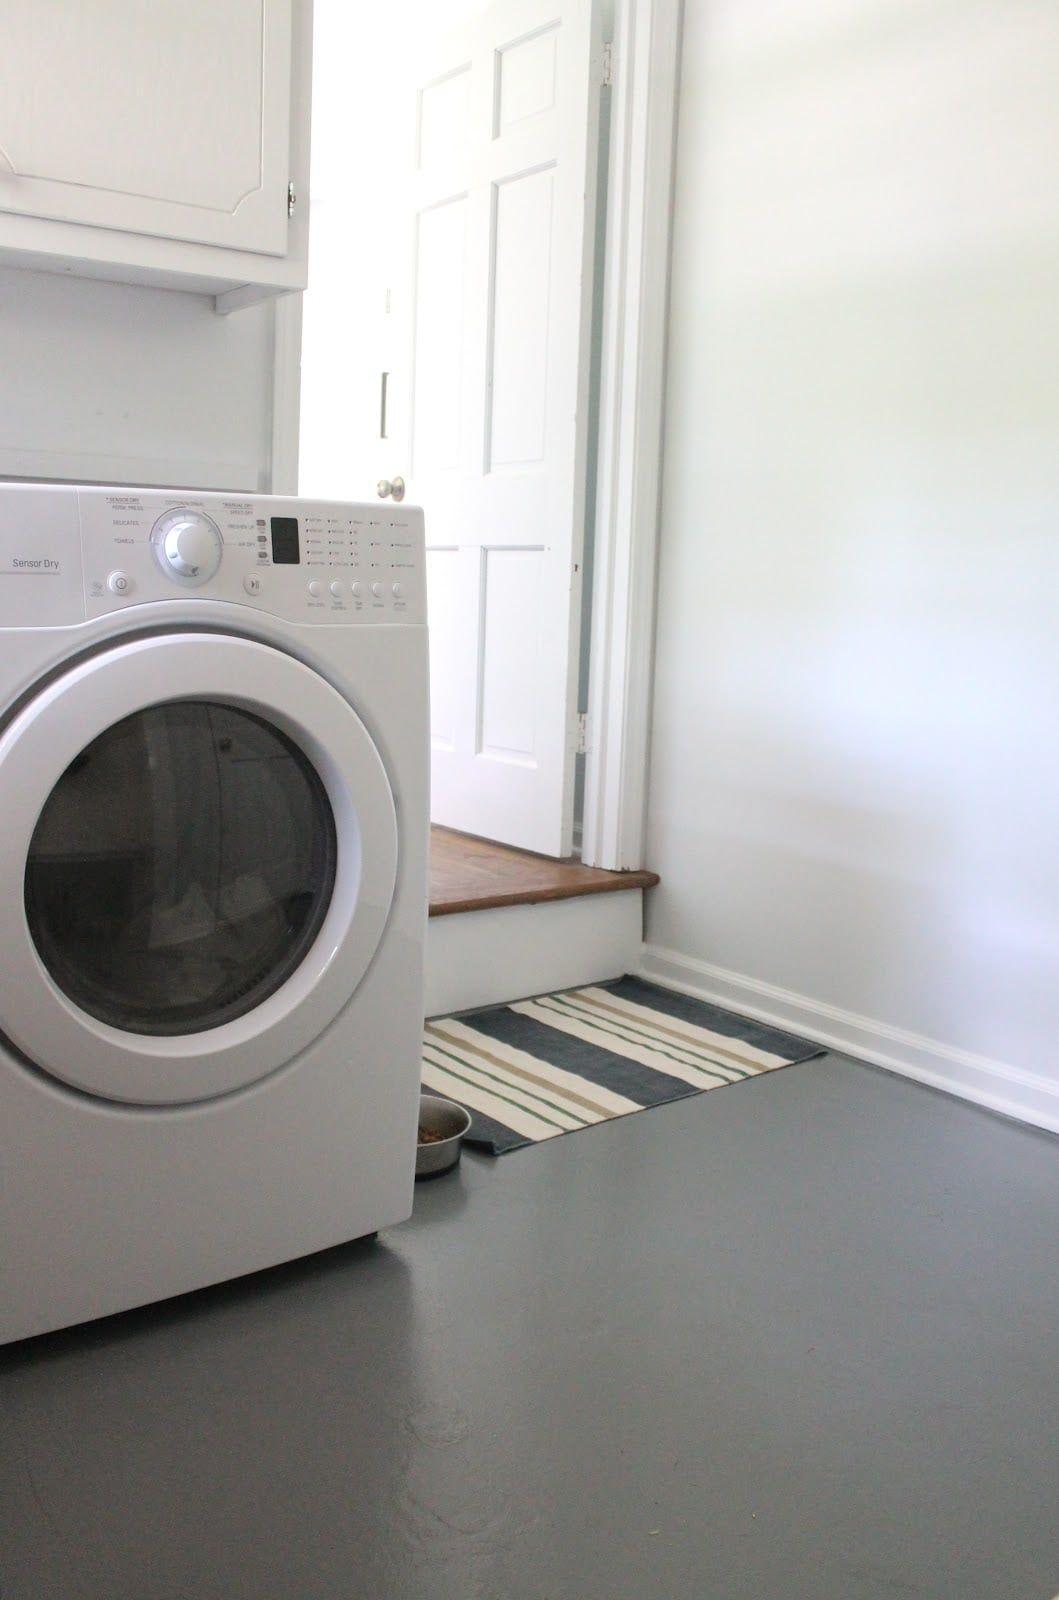 15 Diy Basement Flooring Ideas Affordable Diy Flooring Options For Basements